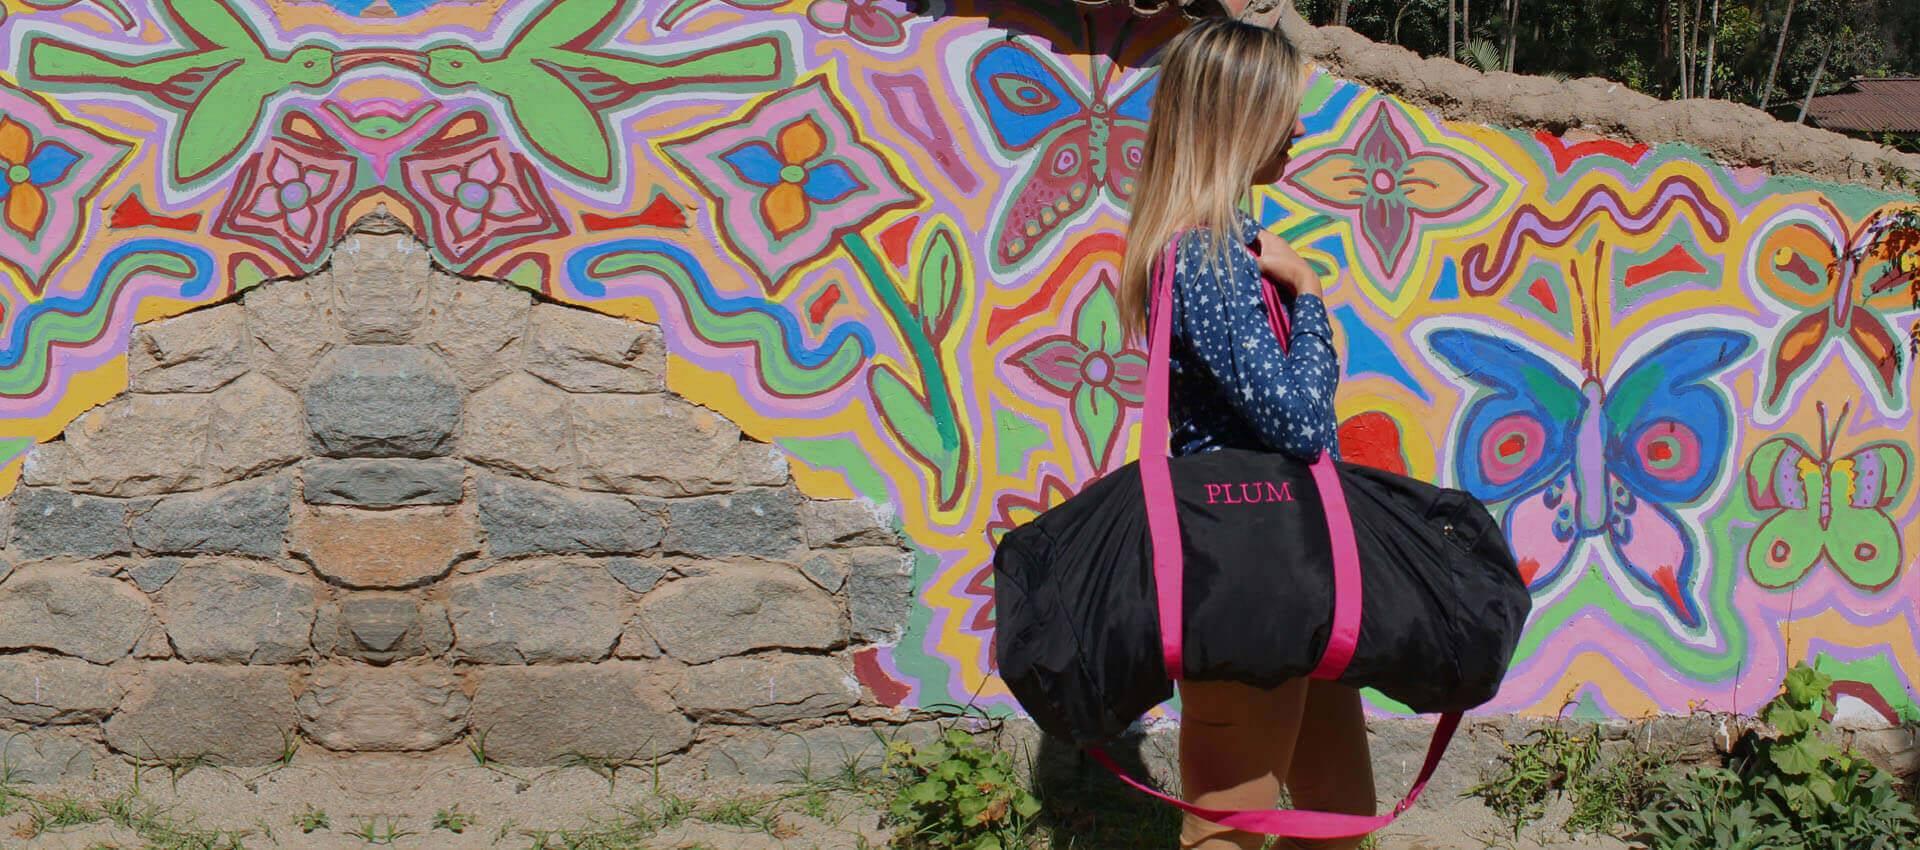 Handbags-Leather_fashion_handbags-Duffle_handbags_weekend-Plum_handbags